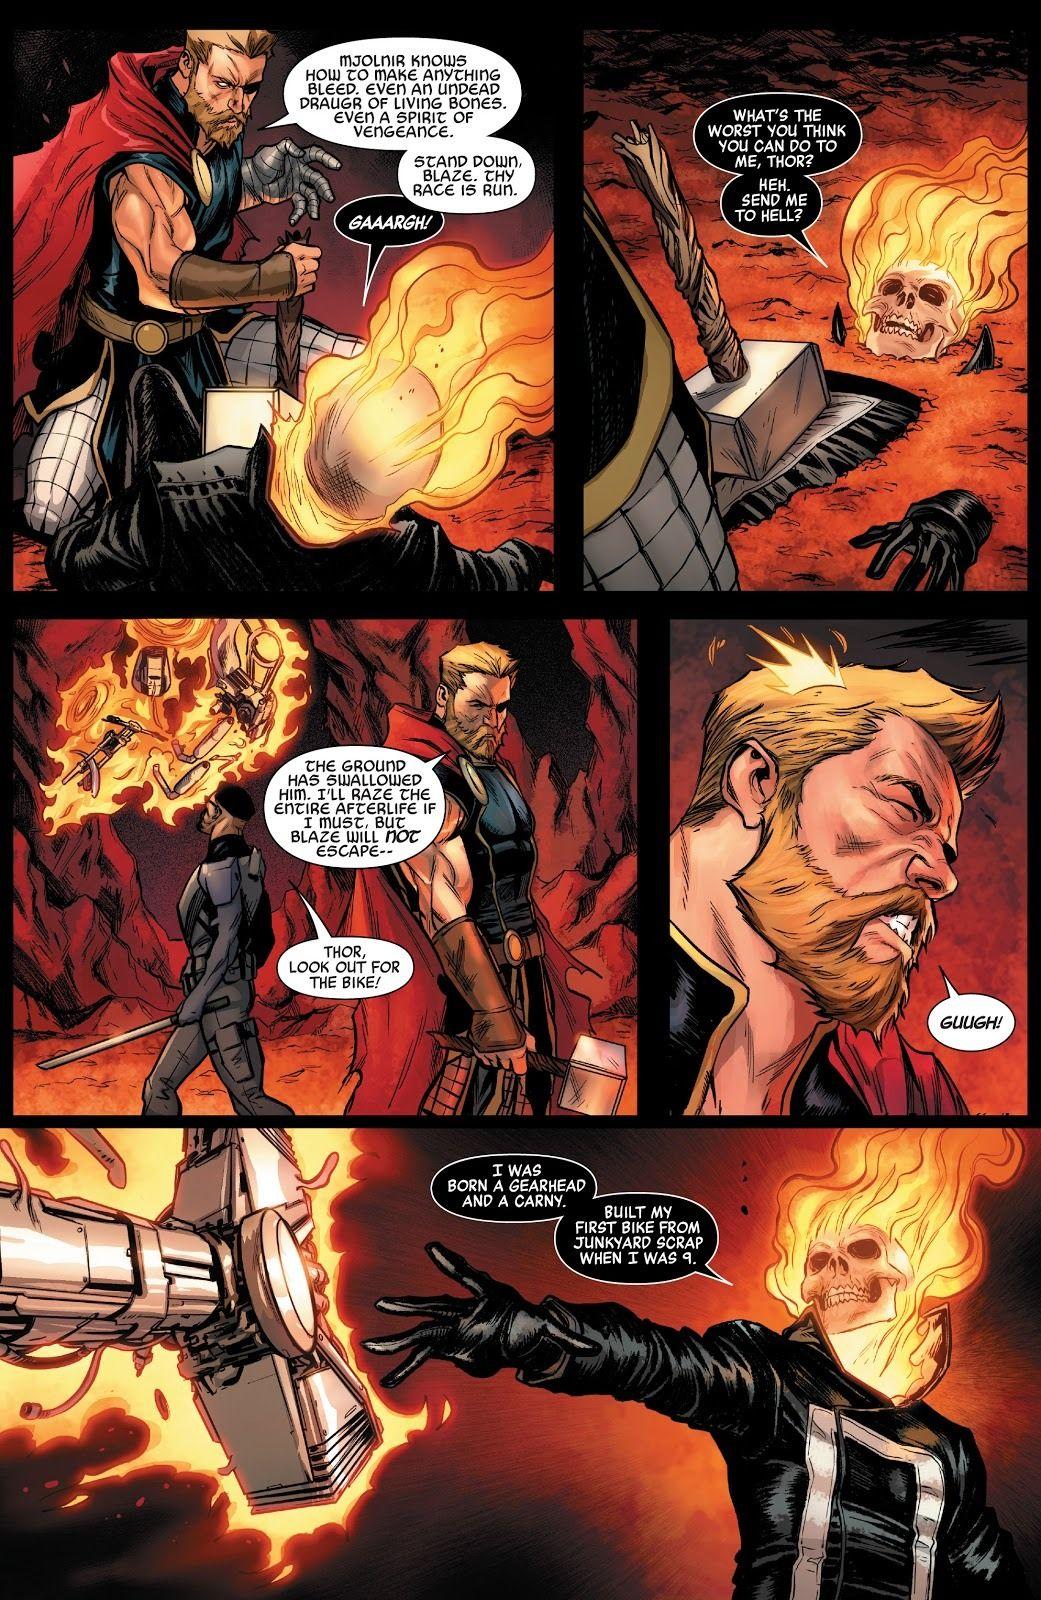 Avengers Vol 8 25 2019 Marvel Comics Ghost Rider Robbie Reyes Story Jason Aaron Art Stefano Caselli G Ghost Rider Marvel Ghost Rider Marvel Comics